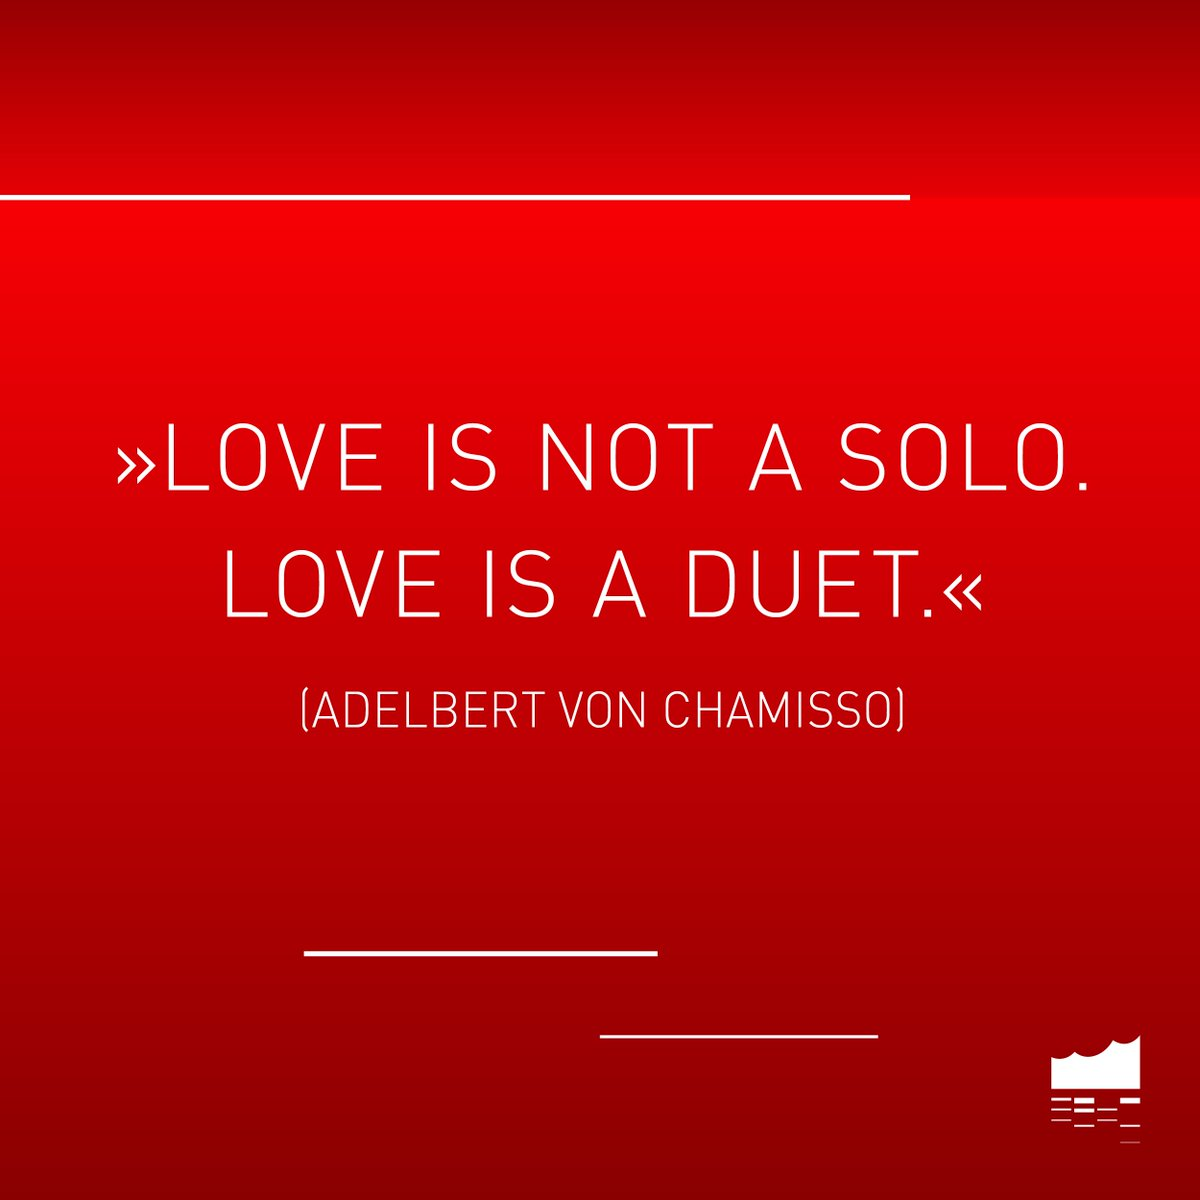 Happy Valentine's Day ❤ #Elbphilharmonie https://t.co/seCHTk0Qez